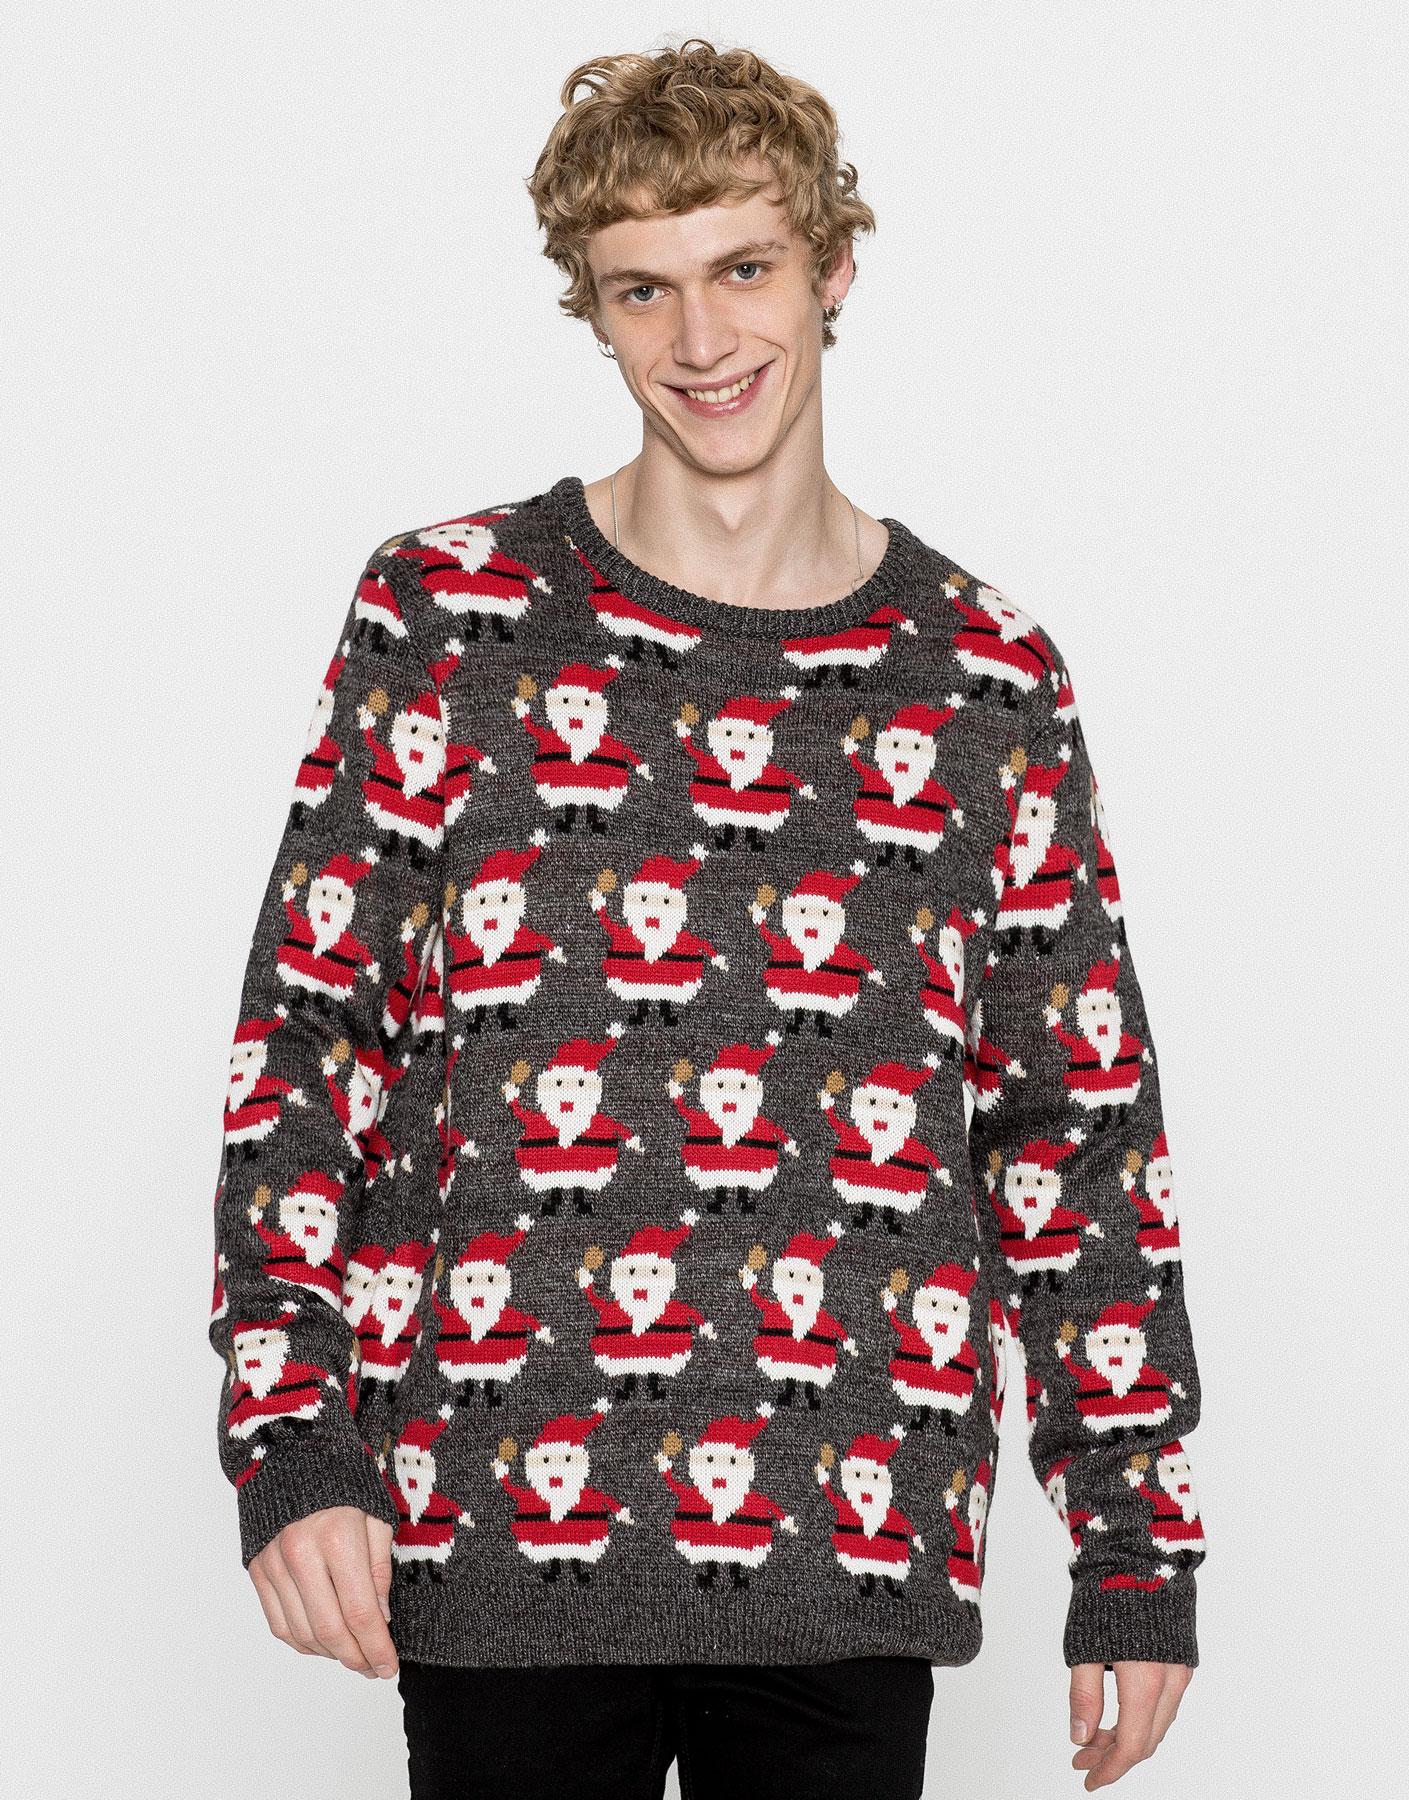 Mini Santa Claus Christmas sweater